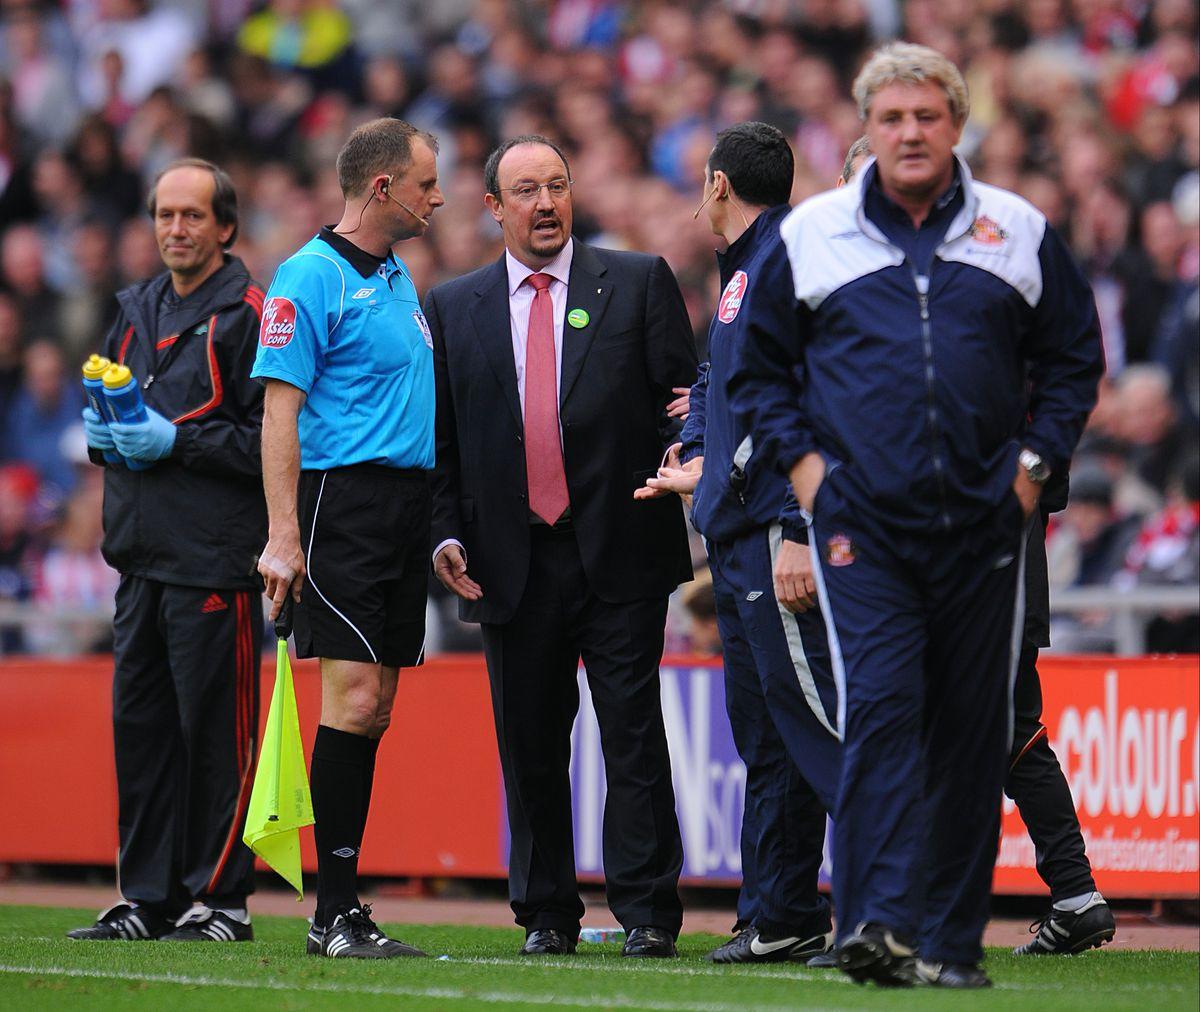 Soccer - Barclays Premier League - Sunderland v Liverpool - Stadium Of Light